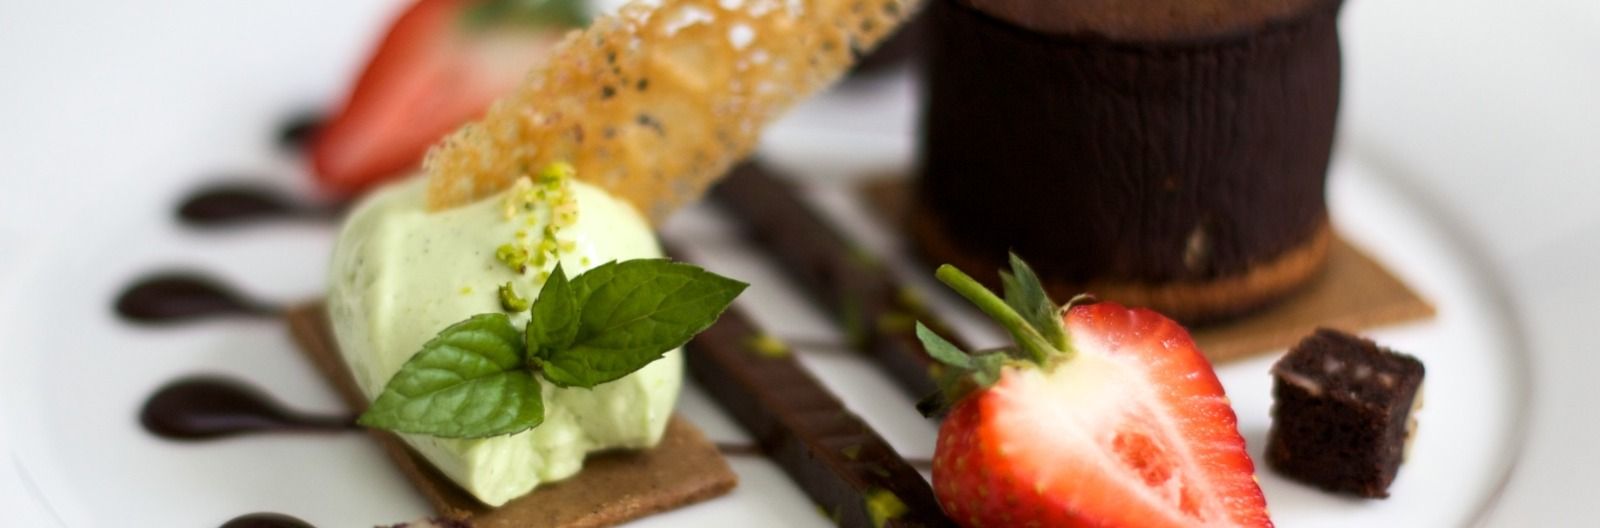 Pudding menu sorbet